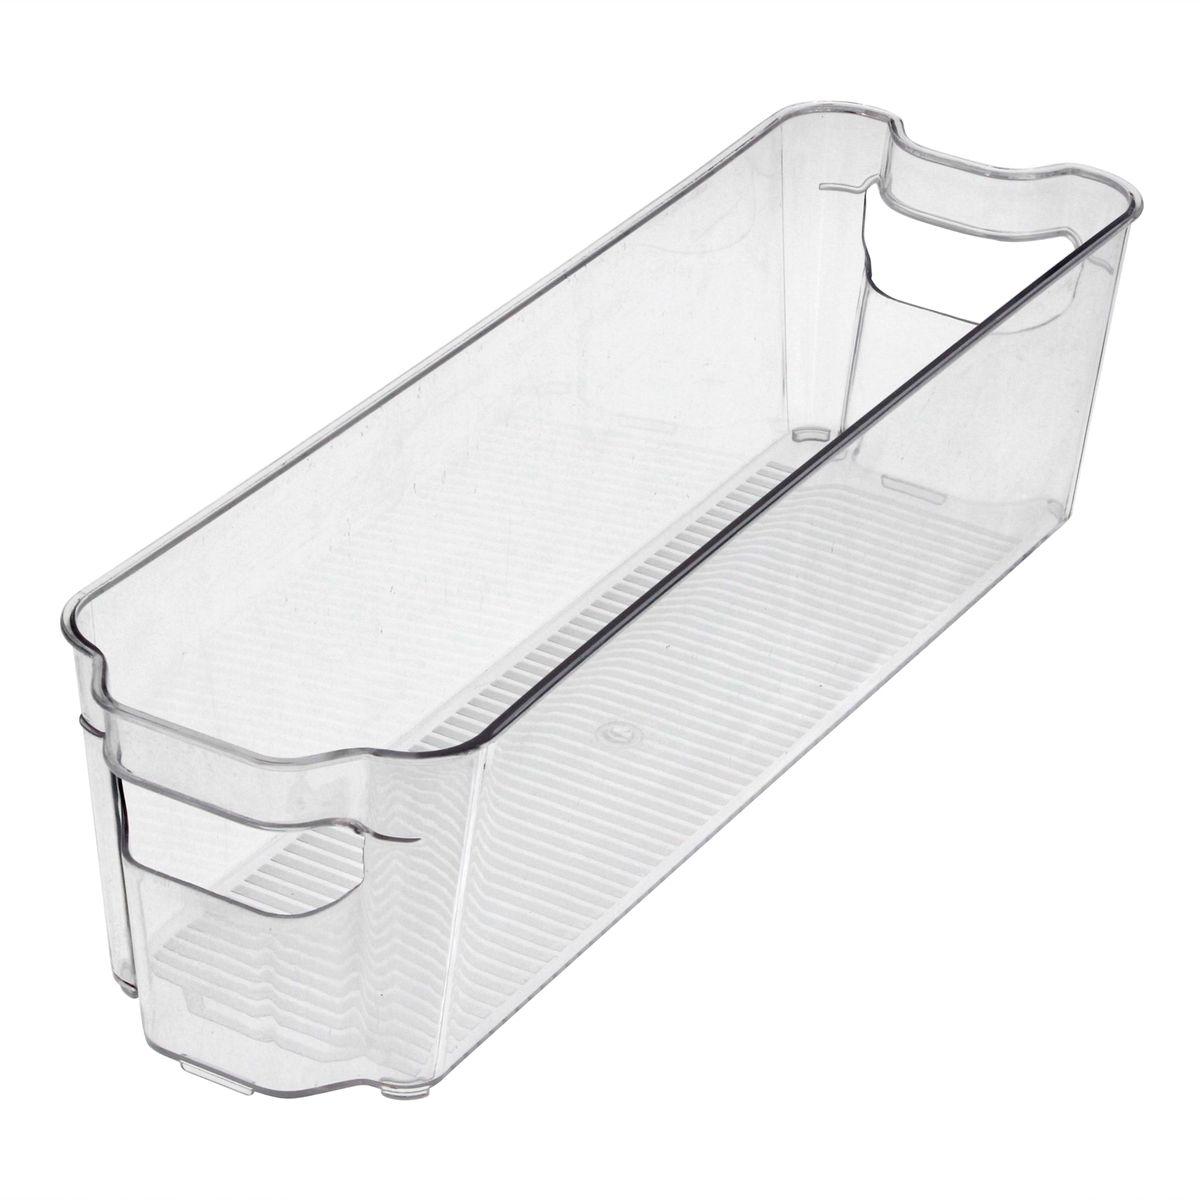 Bac rangement frigo 4l - 5Five